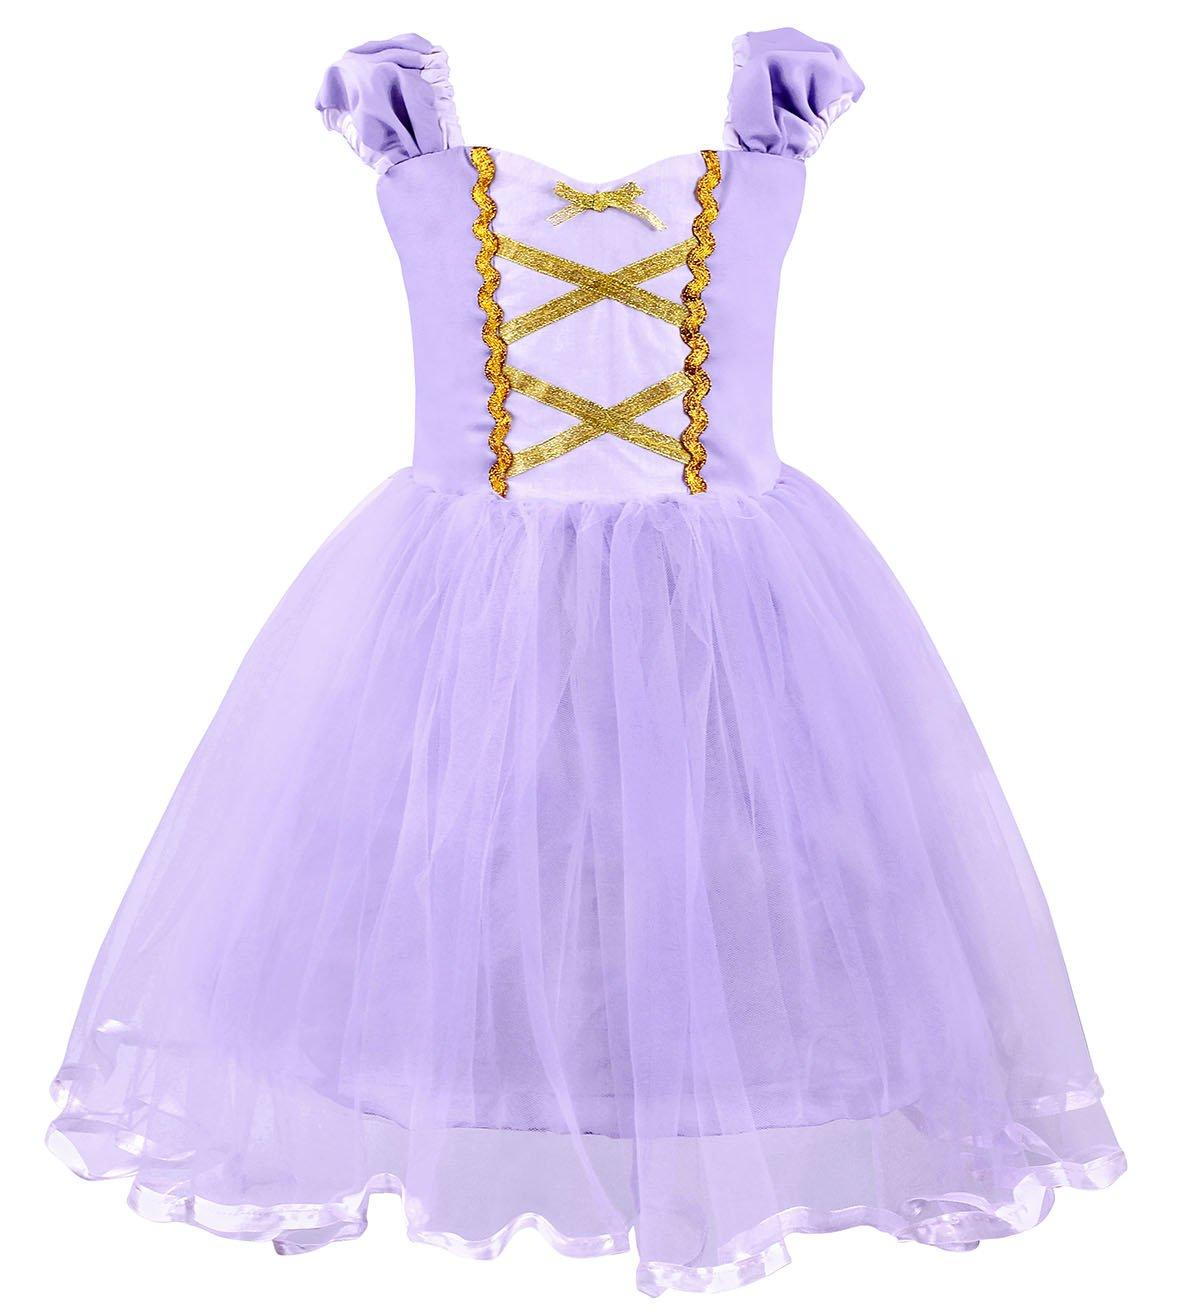 Cotrio Girls Princess Rapunzel Dress up Costume Halloween Cosplay Fancy Party Dresses Size 4T (110, Rapunzel Tutu Dress) by Cotrio (Image #1)